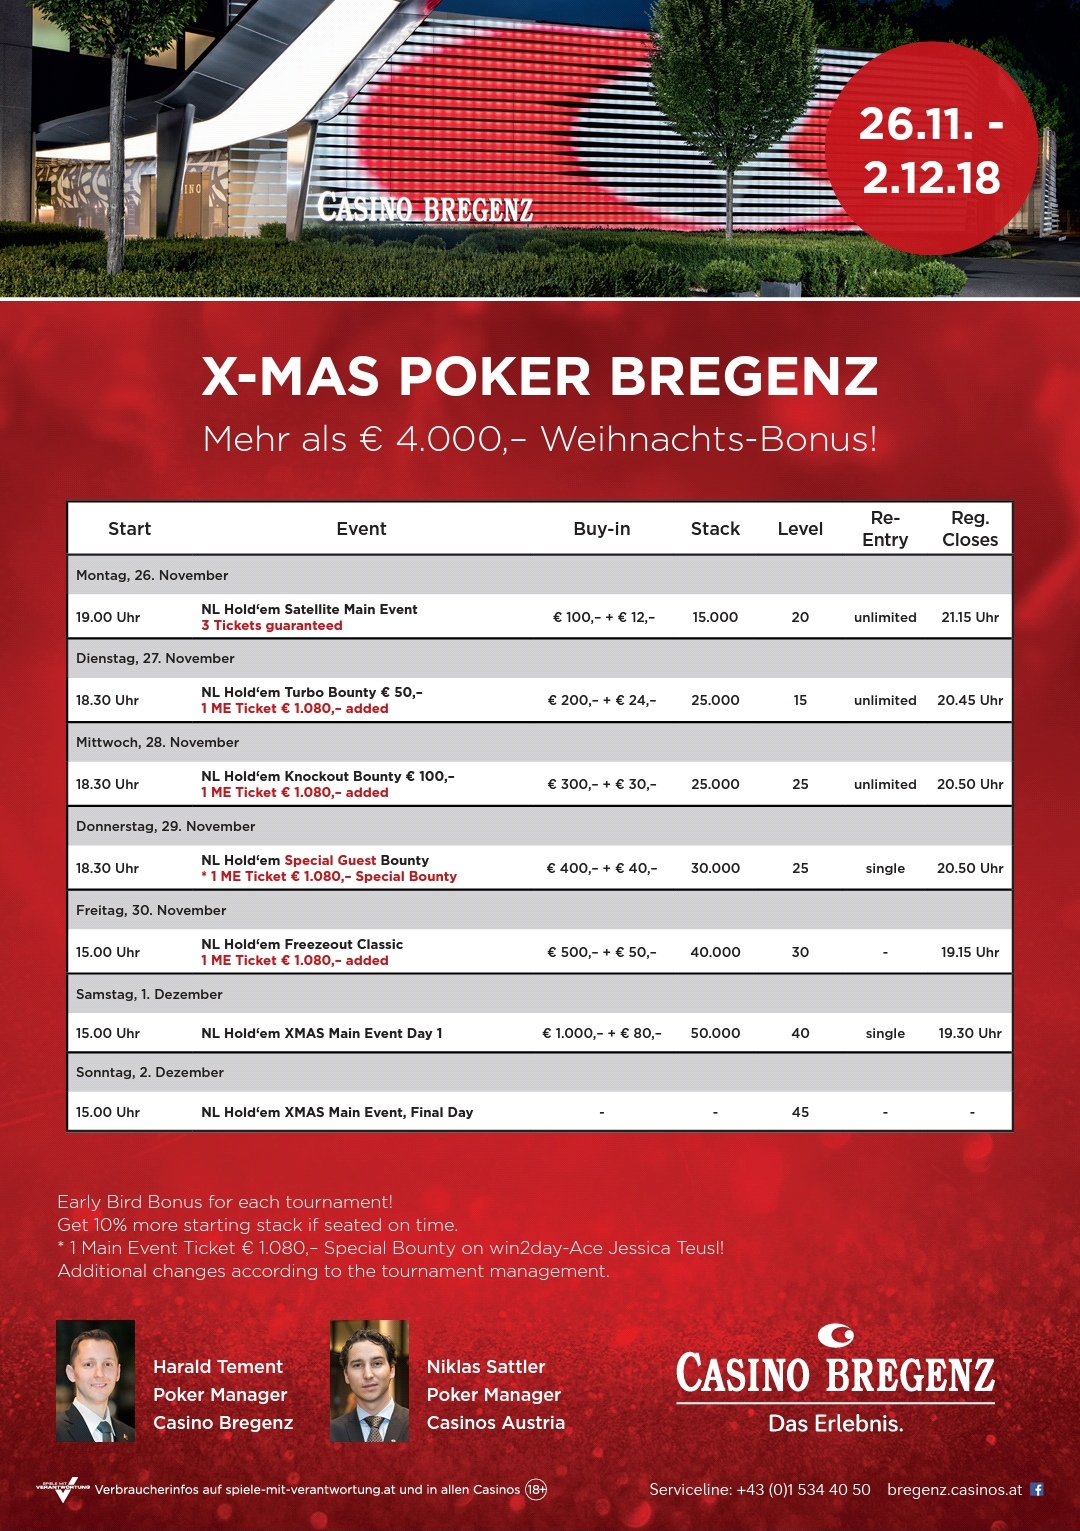 X-Mas Poker im Casino Bregenz